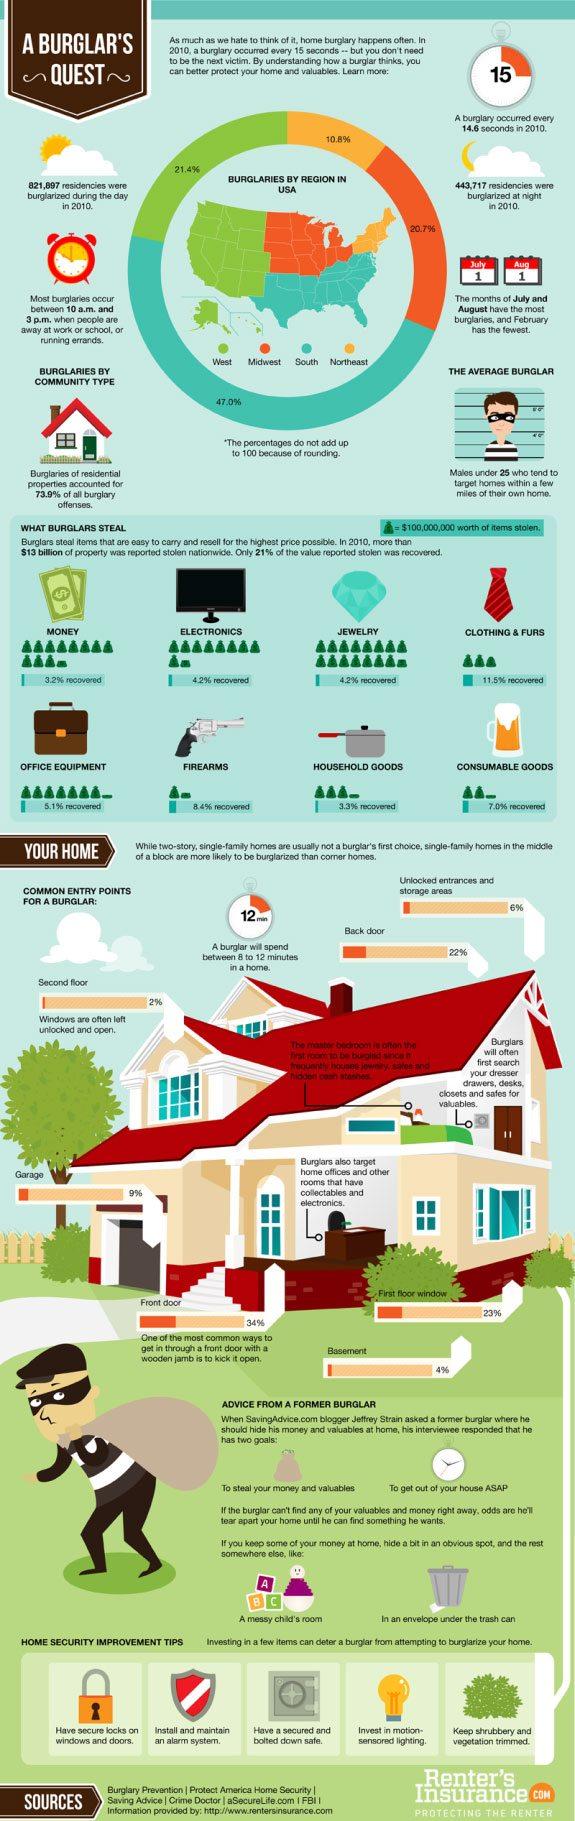 A Burglar's Quest Infographic